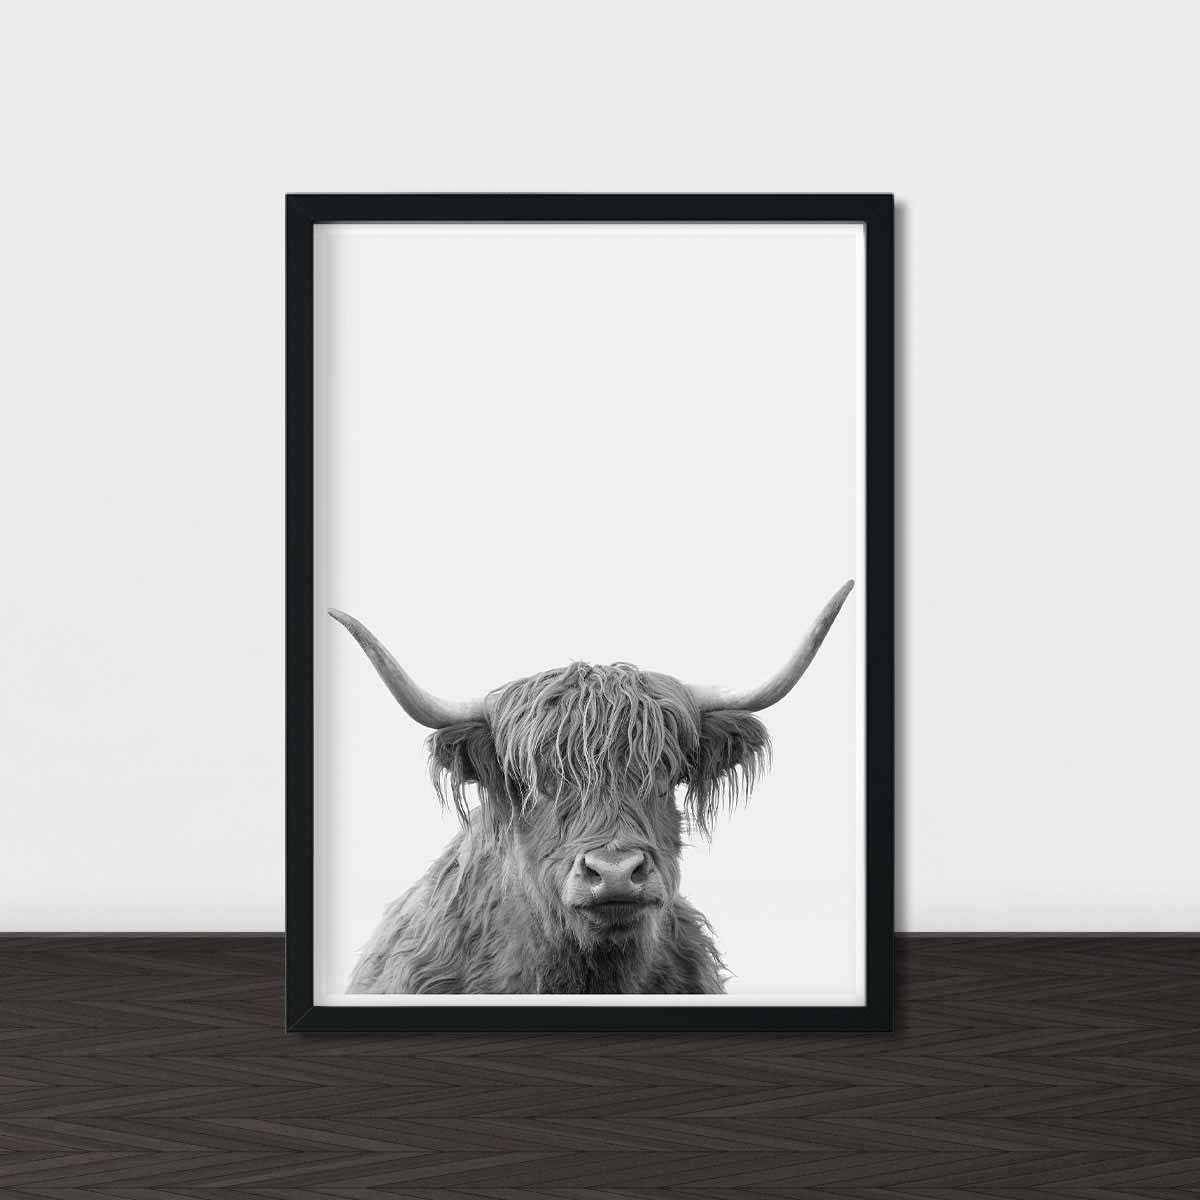 Highland Cow Print Printable Art Wall Art Black and White